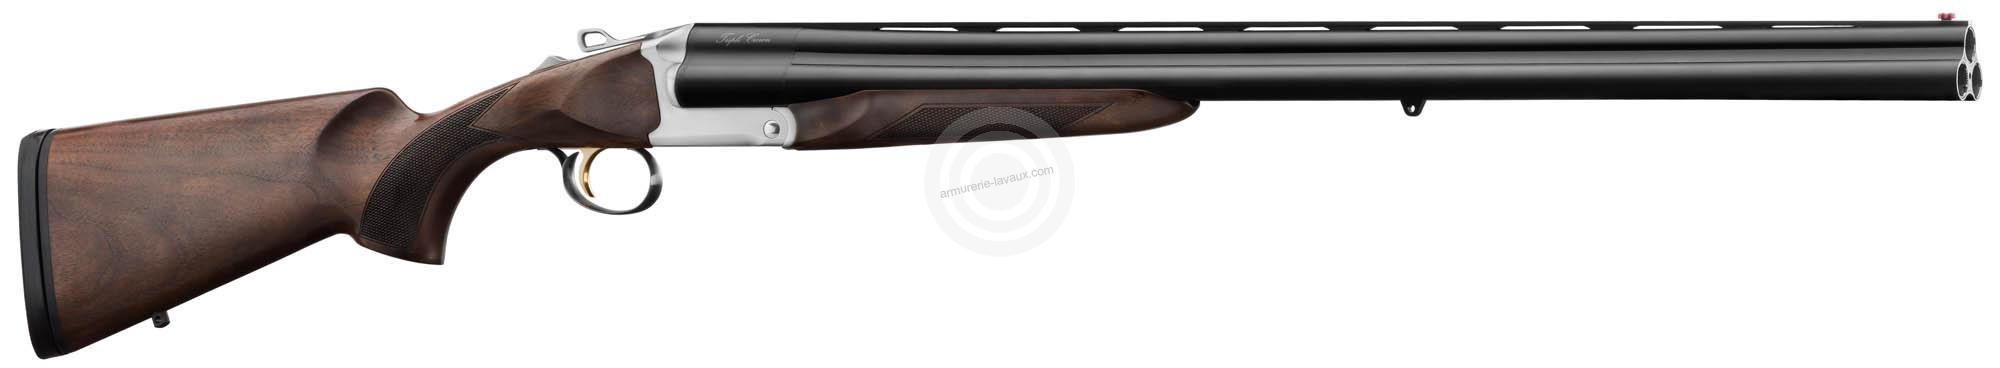 Triple Crown - Fusil de chasse CHIAPPA à 3 canons Cal 20/76